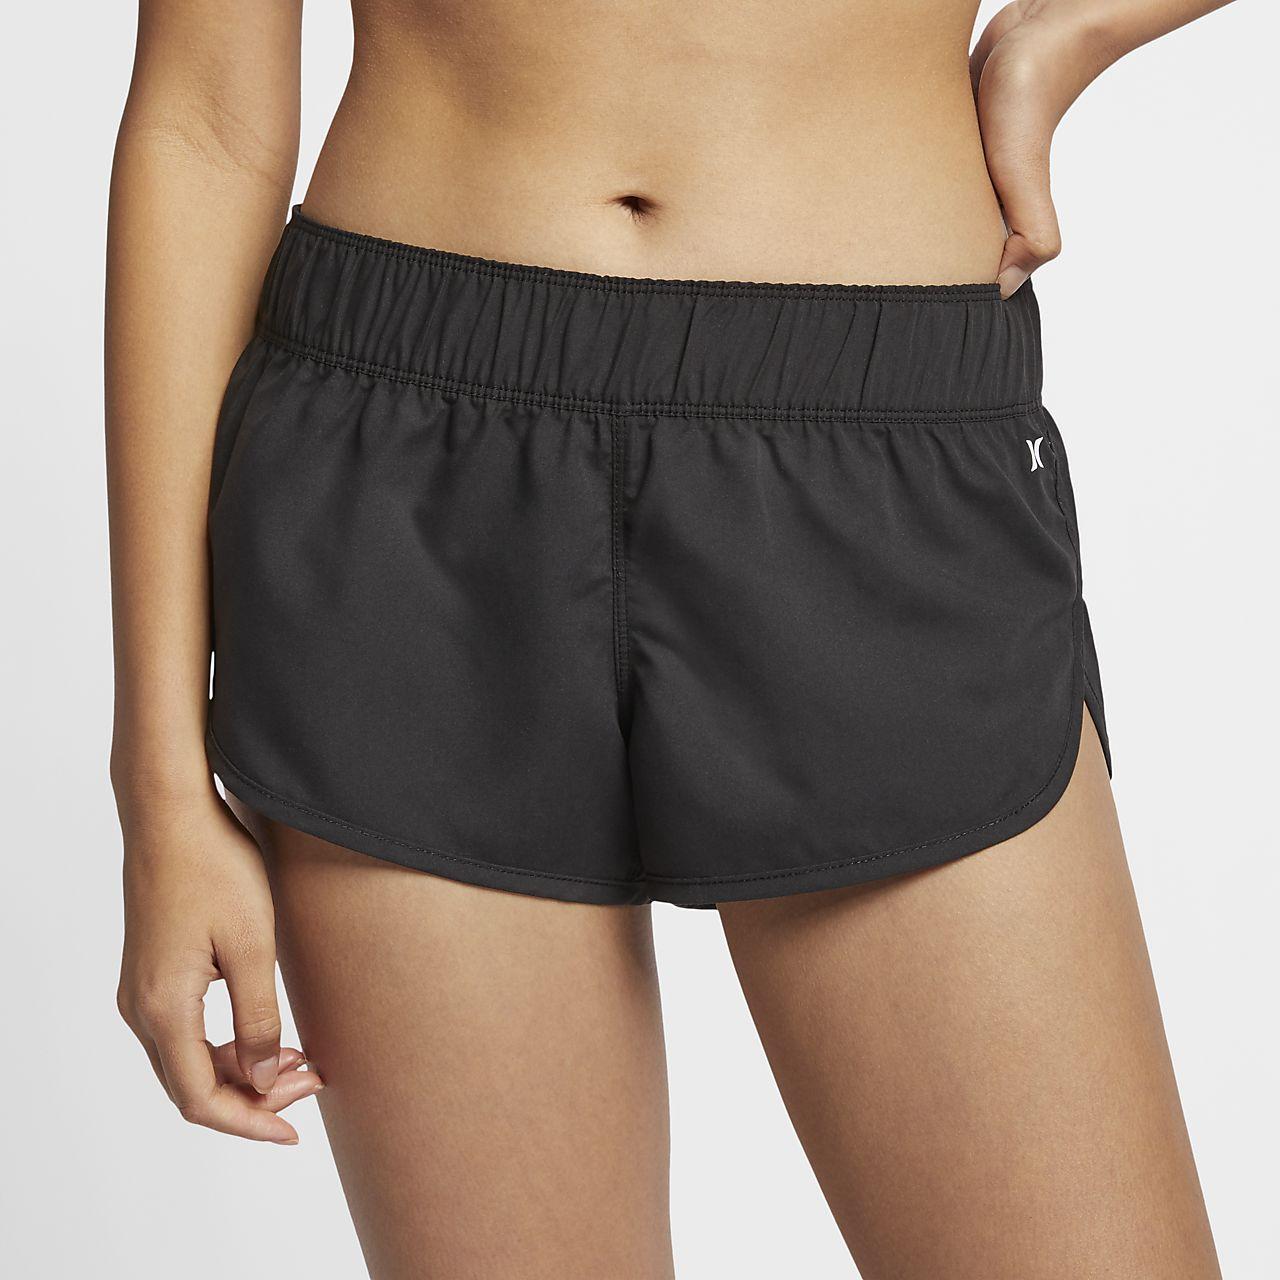 Nike Womens Boardshorts - Nike Hurley Supersuede Printed Beachrider Black Y50i5314